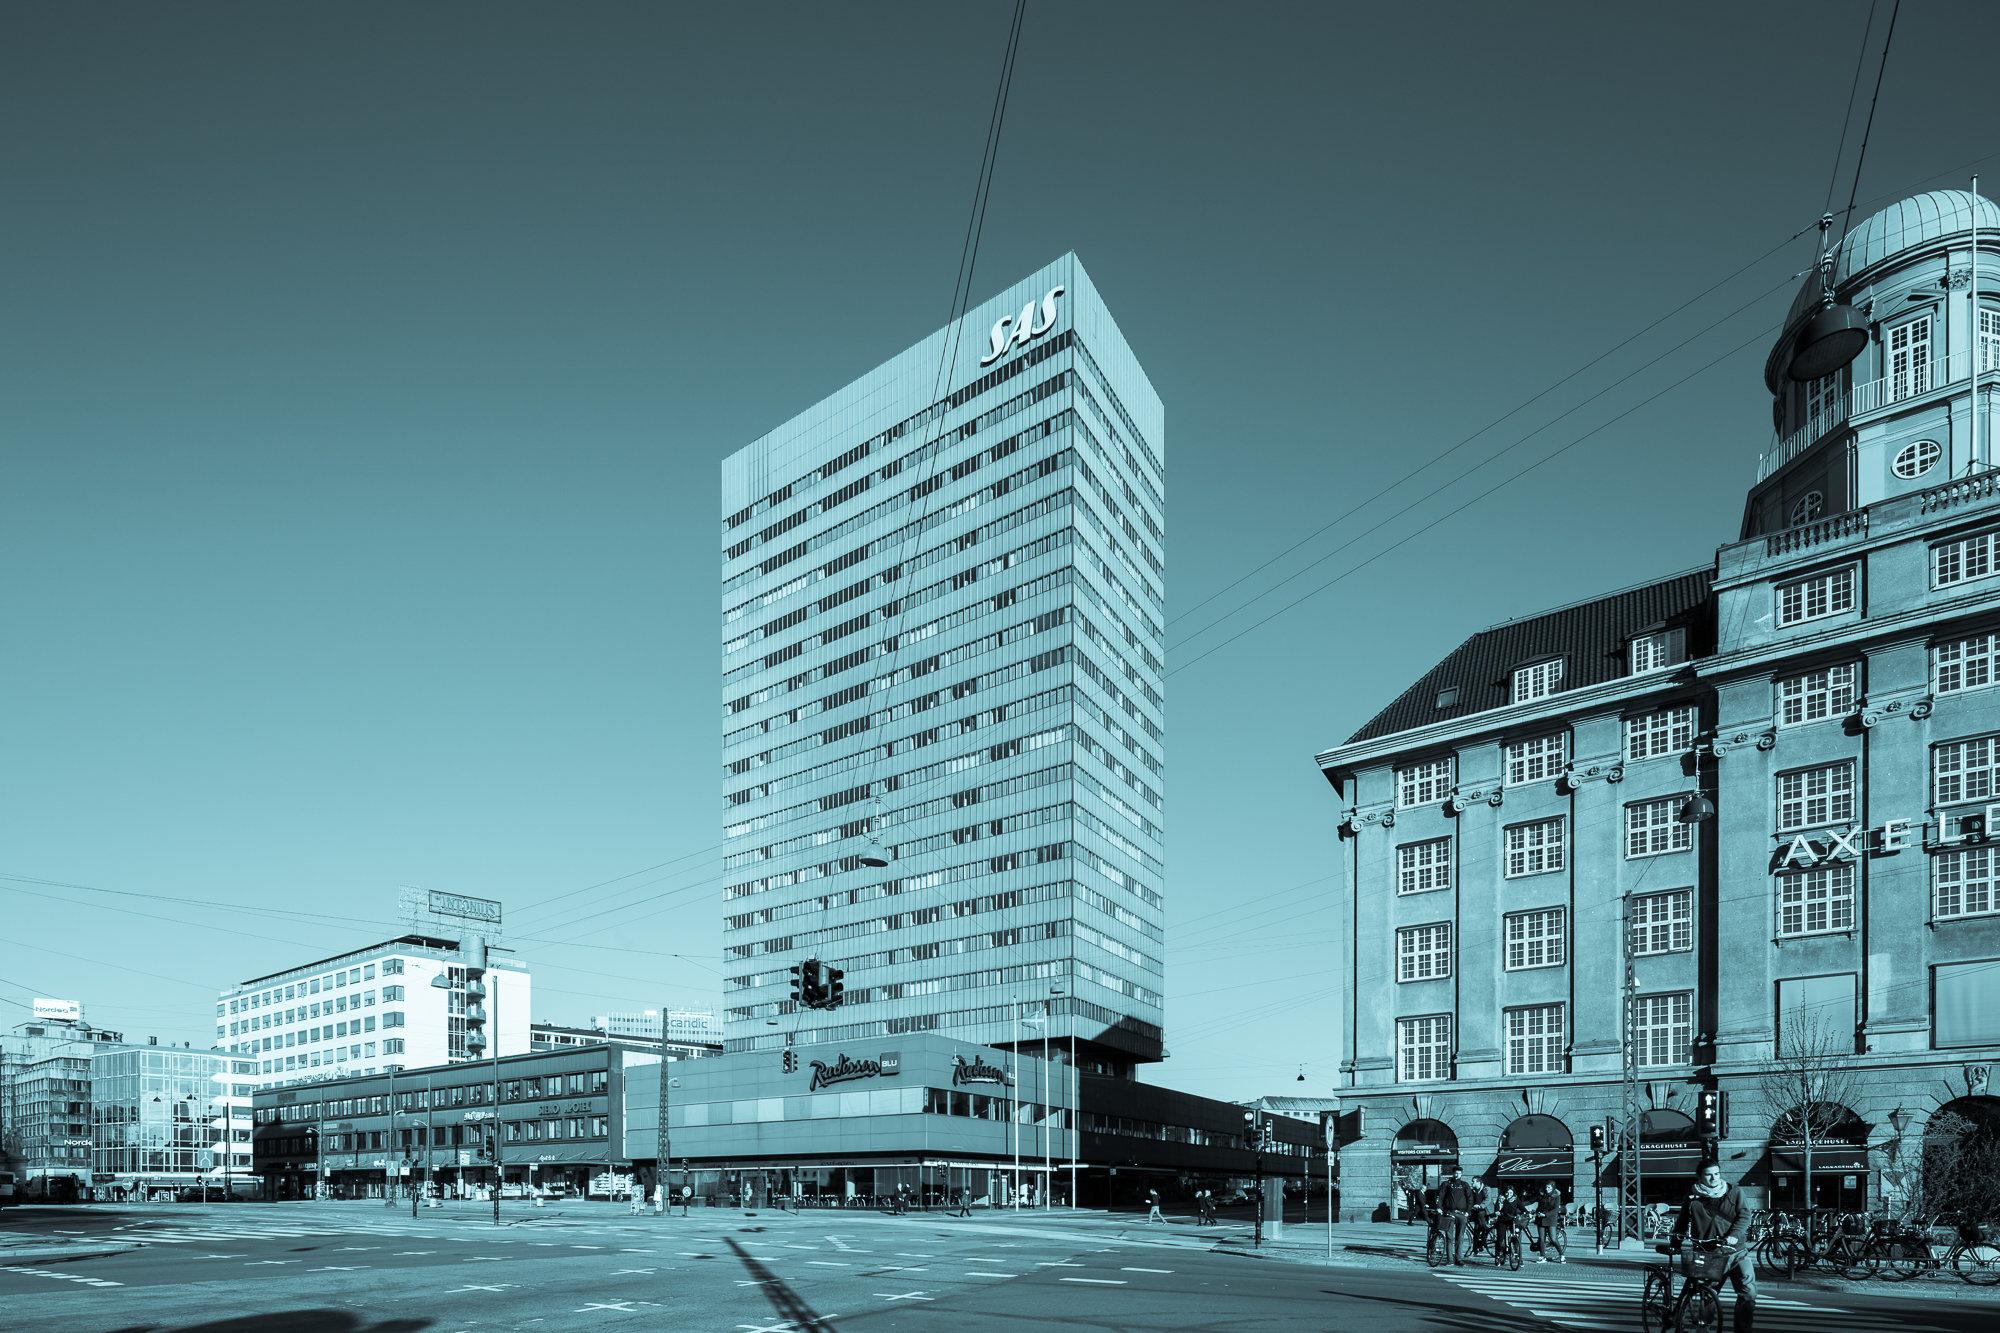 SAS ROYAL HOTEL [COPENHAGEN]